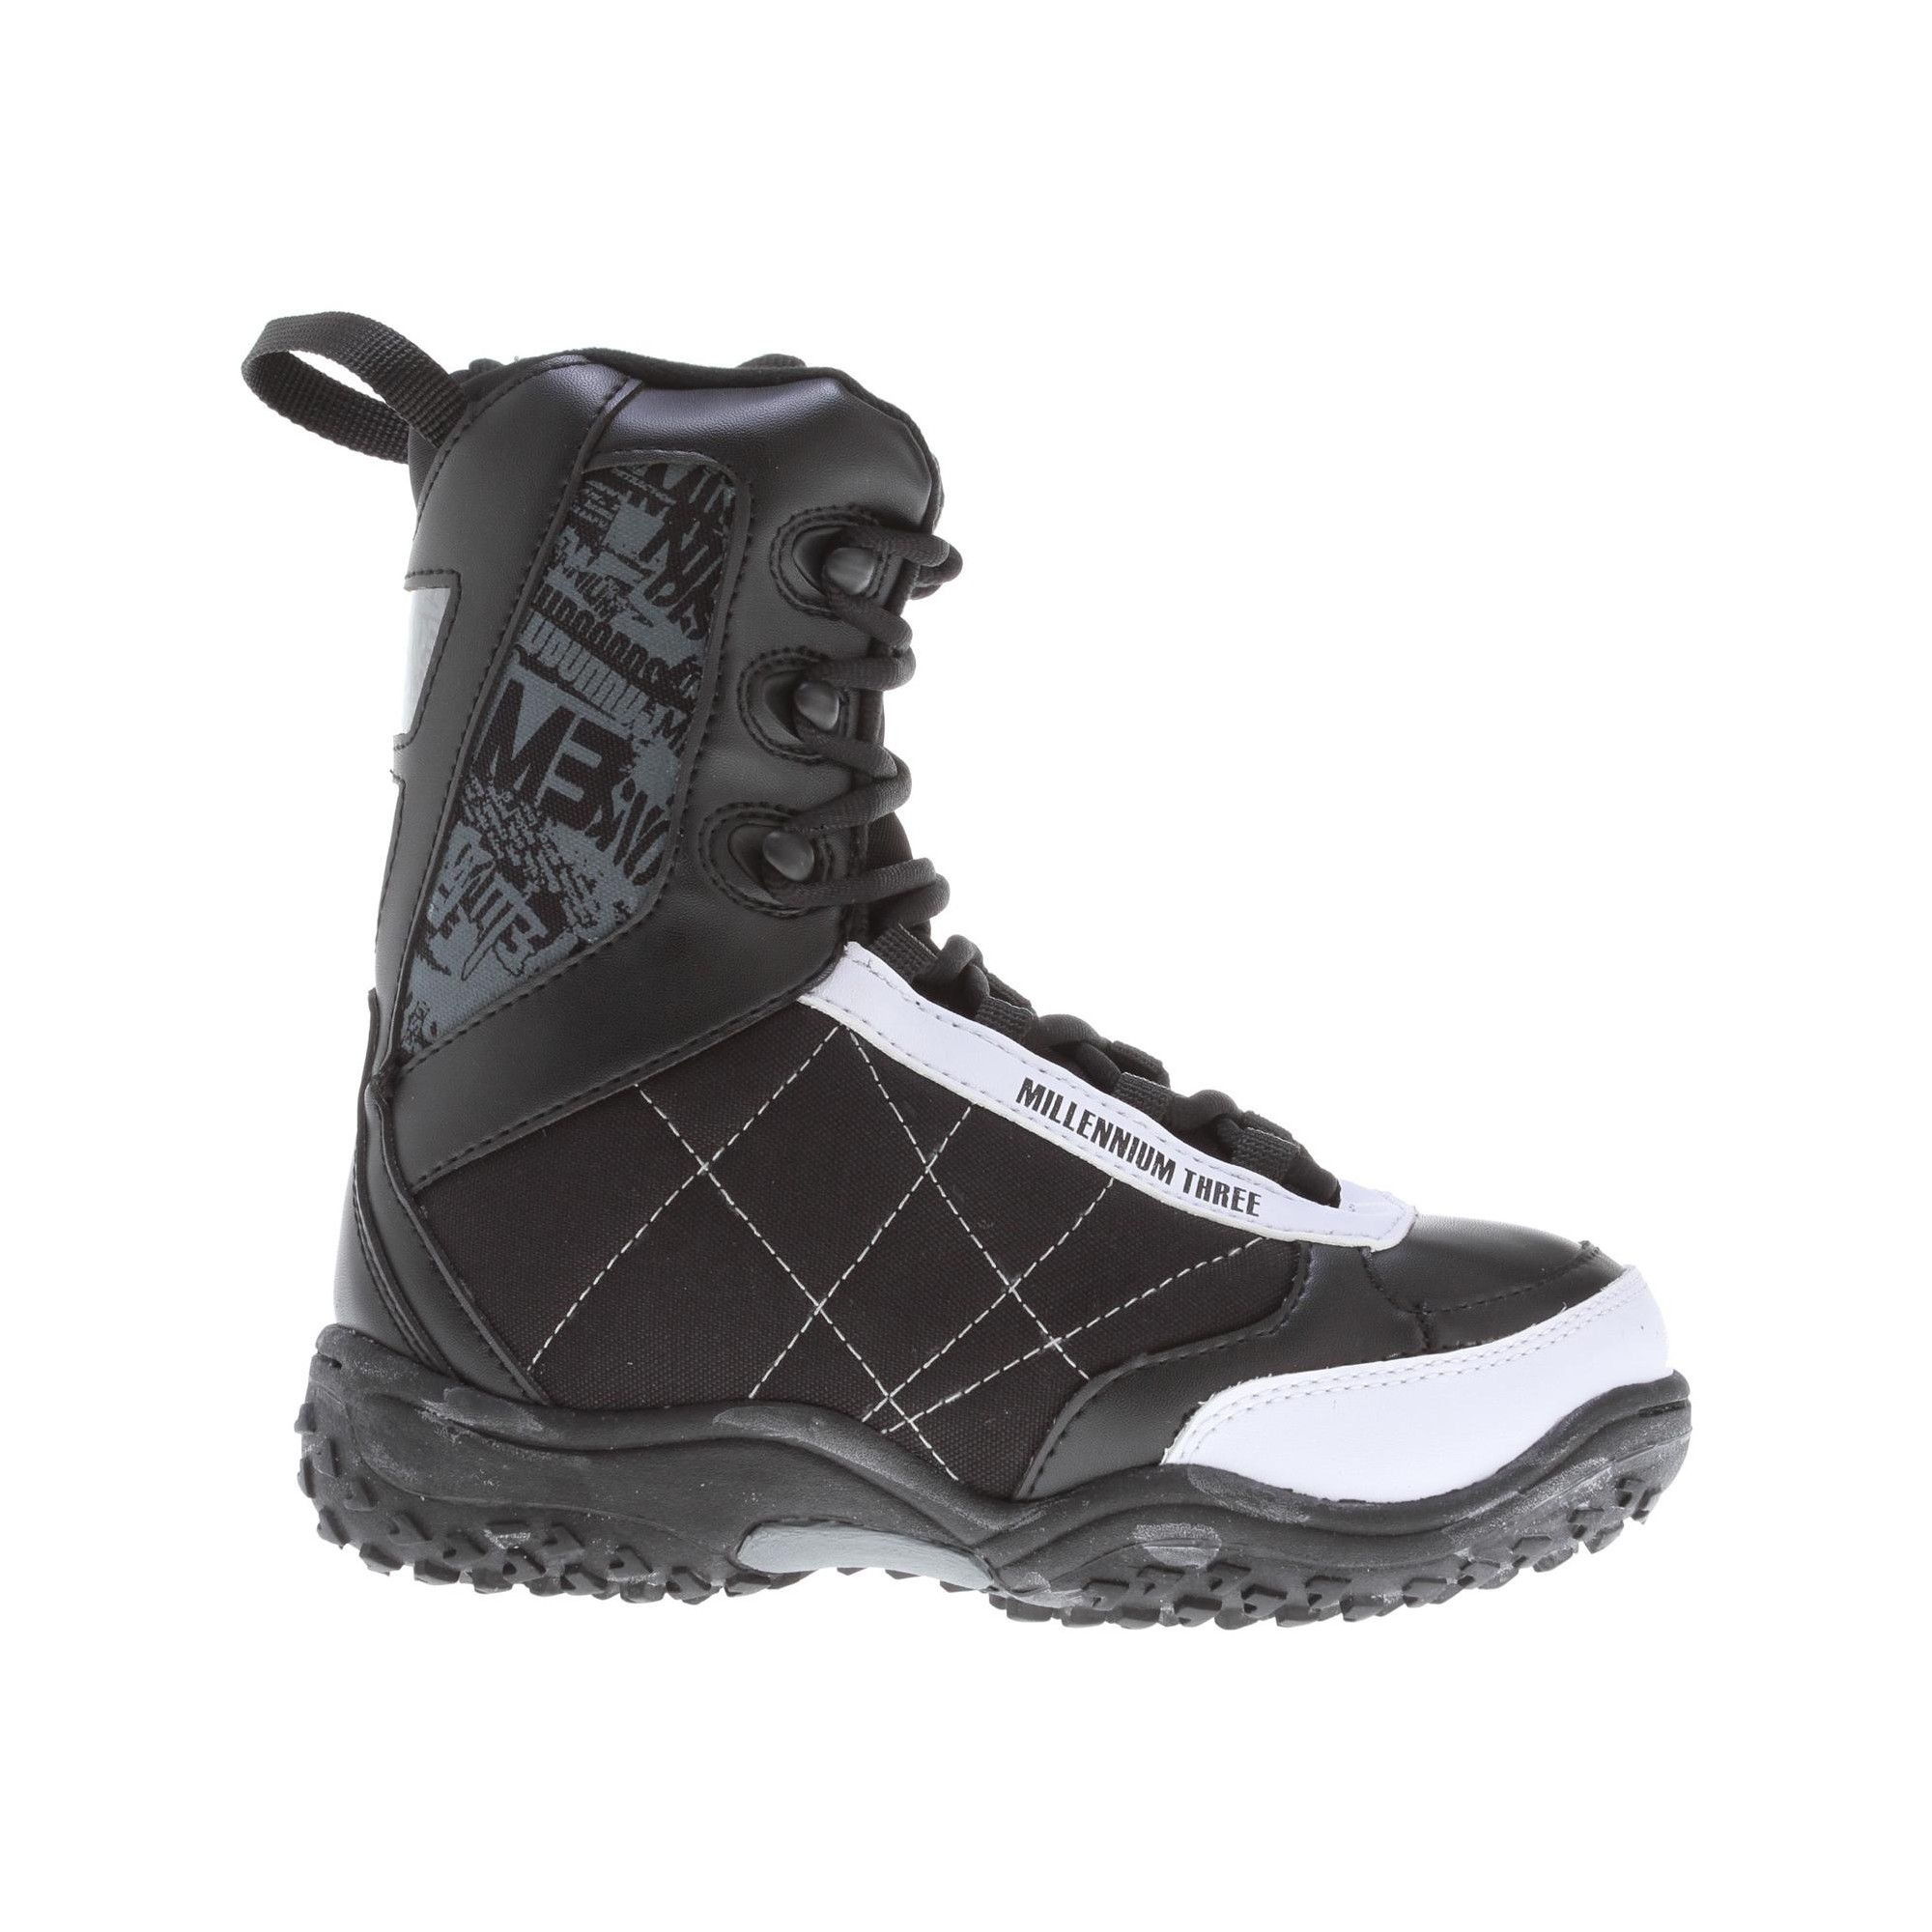 f80780c12c2c M3 Militia Jr. Snowboard Boots Black White Kids Sz 3